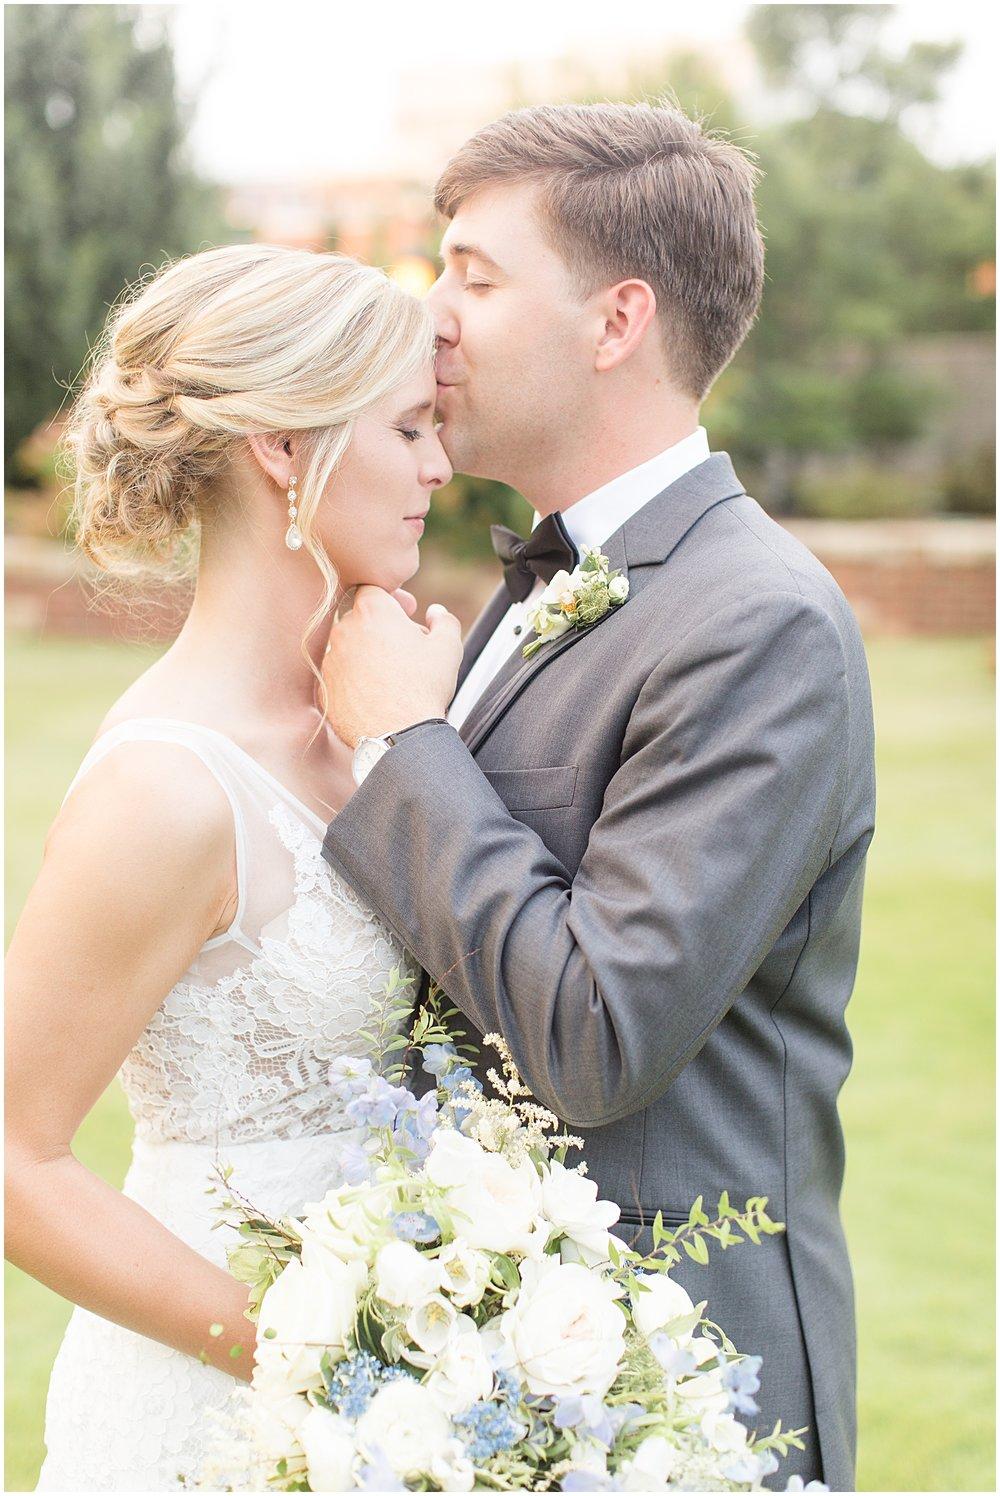 A Shades of Blue Summer Wedding in Spartanburg, SC | Bespoken | Christa Rene Photography | Wedding Planner